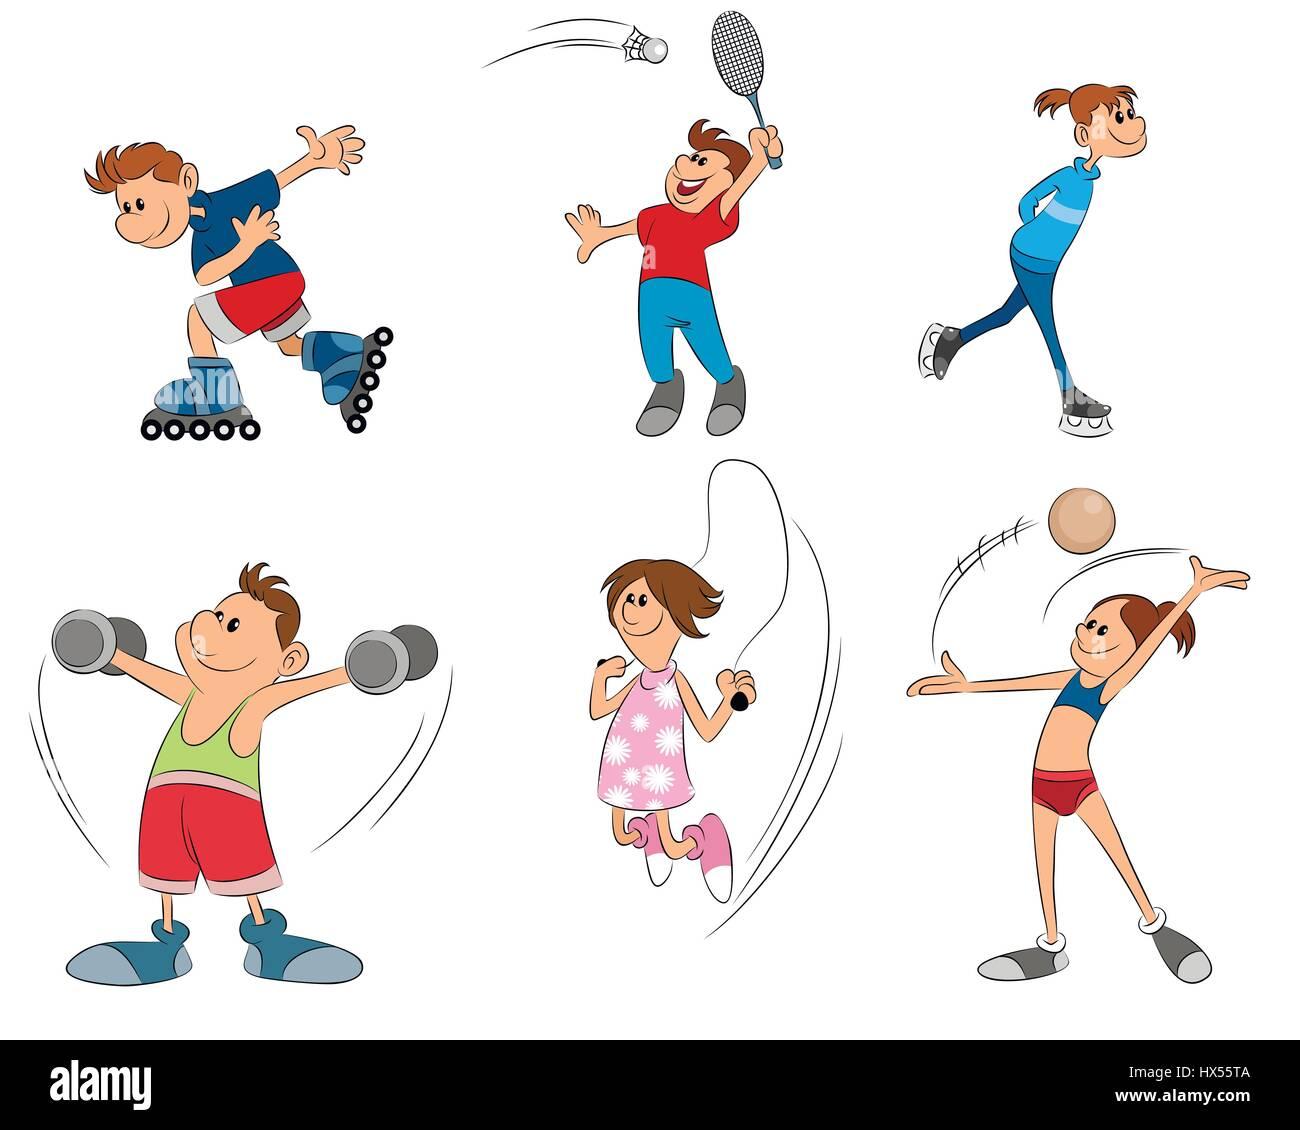 vector illustration of six kids practice sport - Stock Image